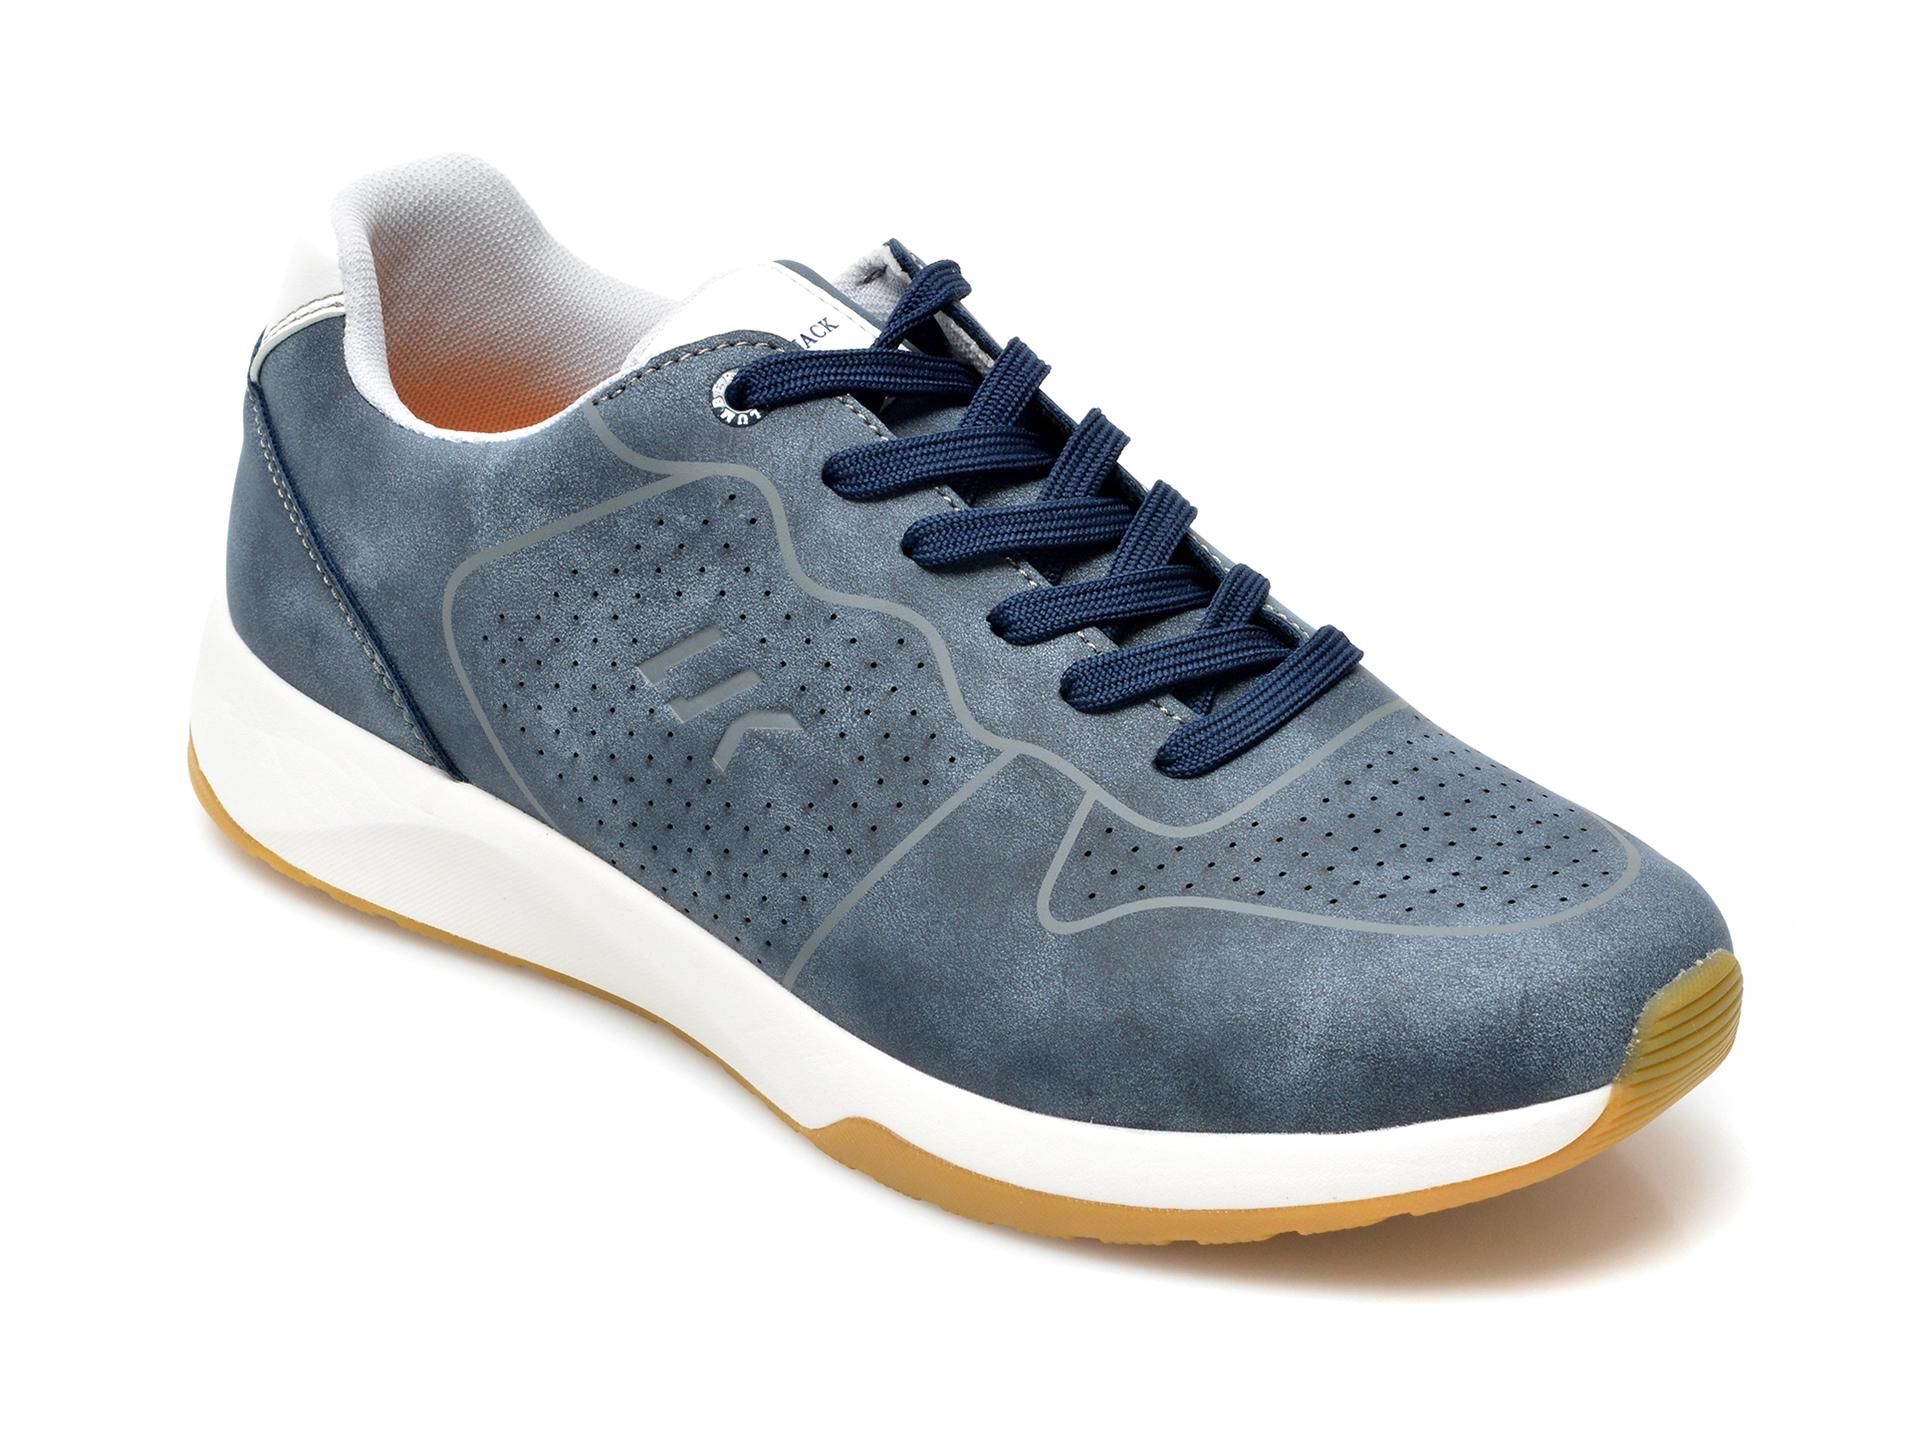 Pantofi Sport Lumberjack Albastri, 8651003, Din Piele Ecologica